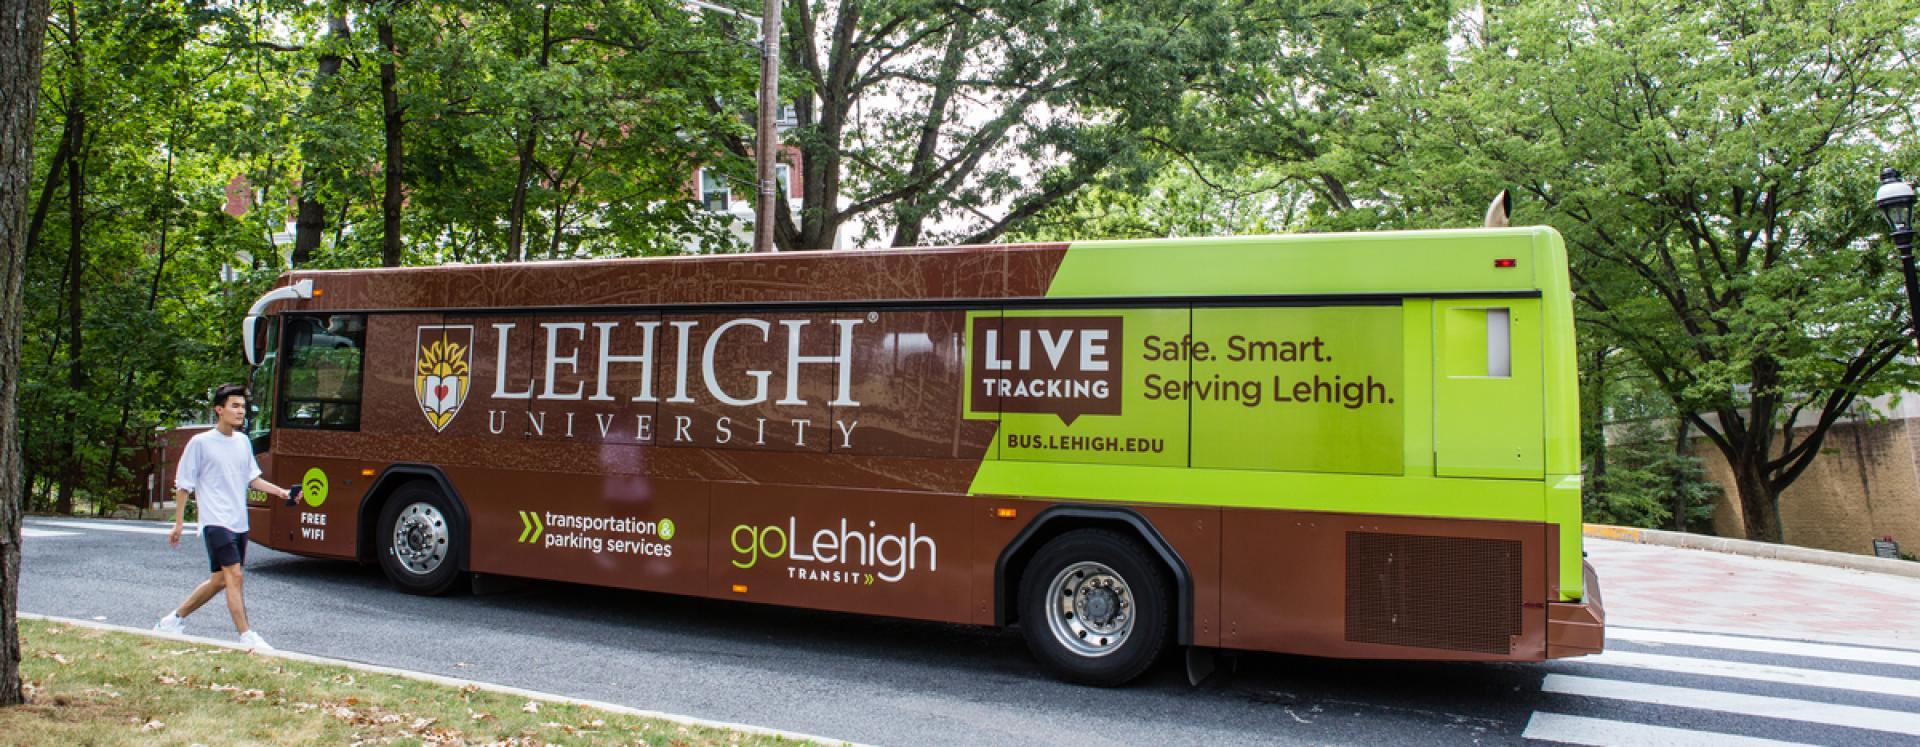 lehigh bus